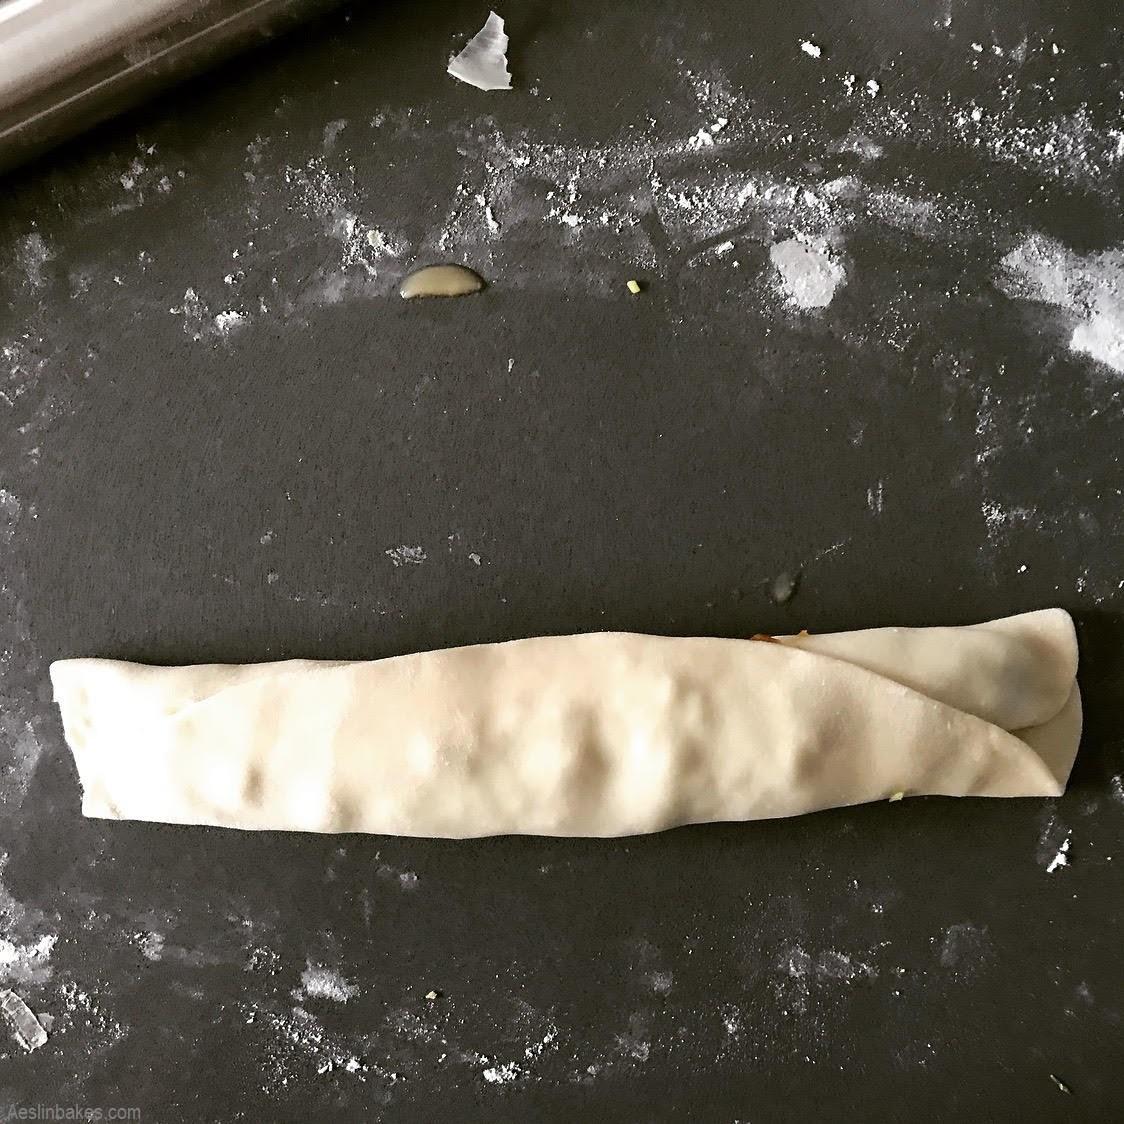 scallion pancake rolled up